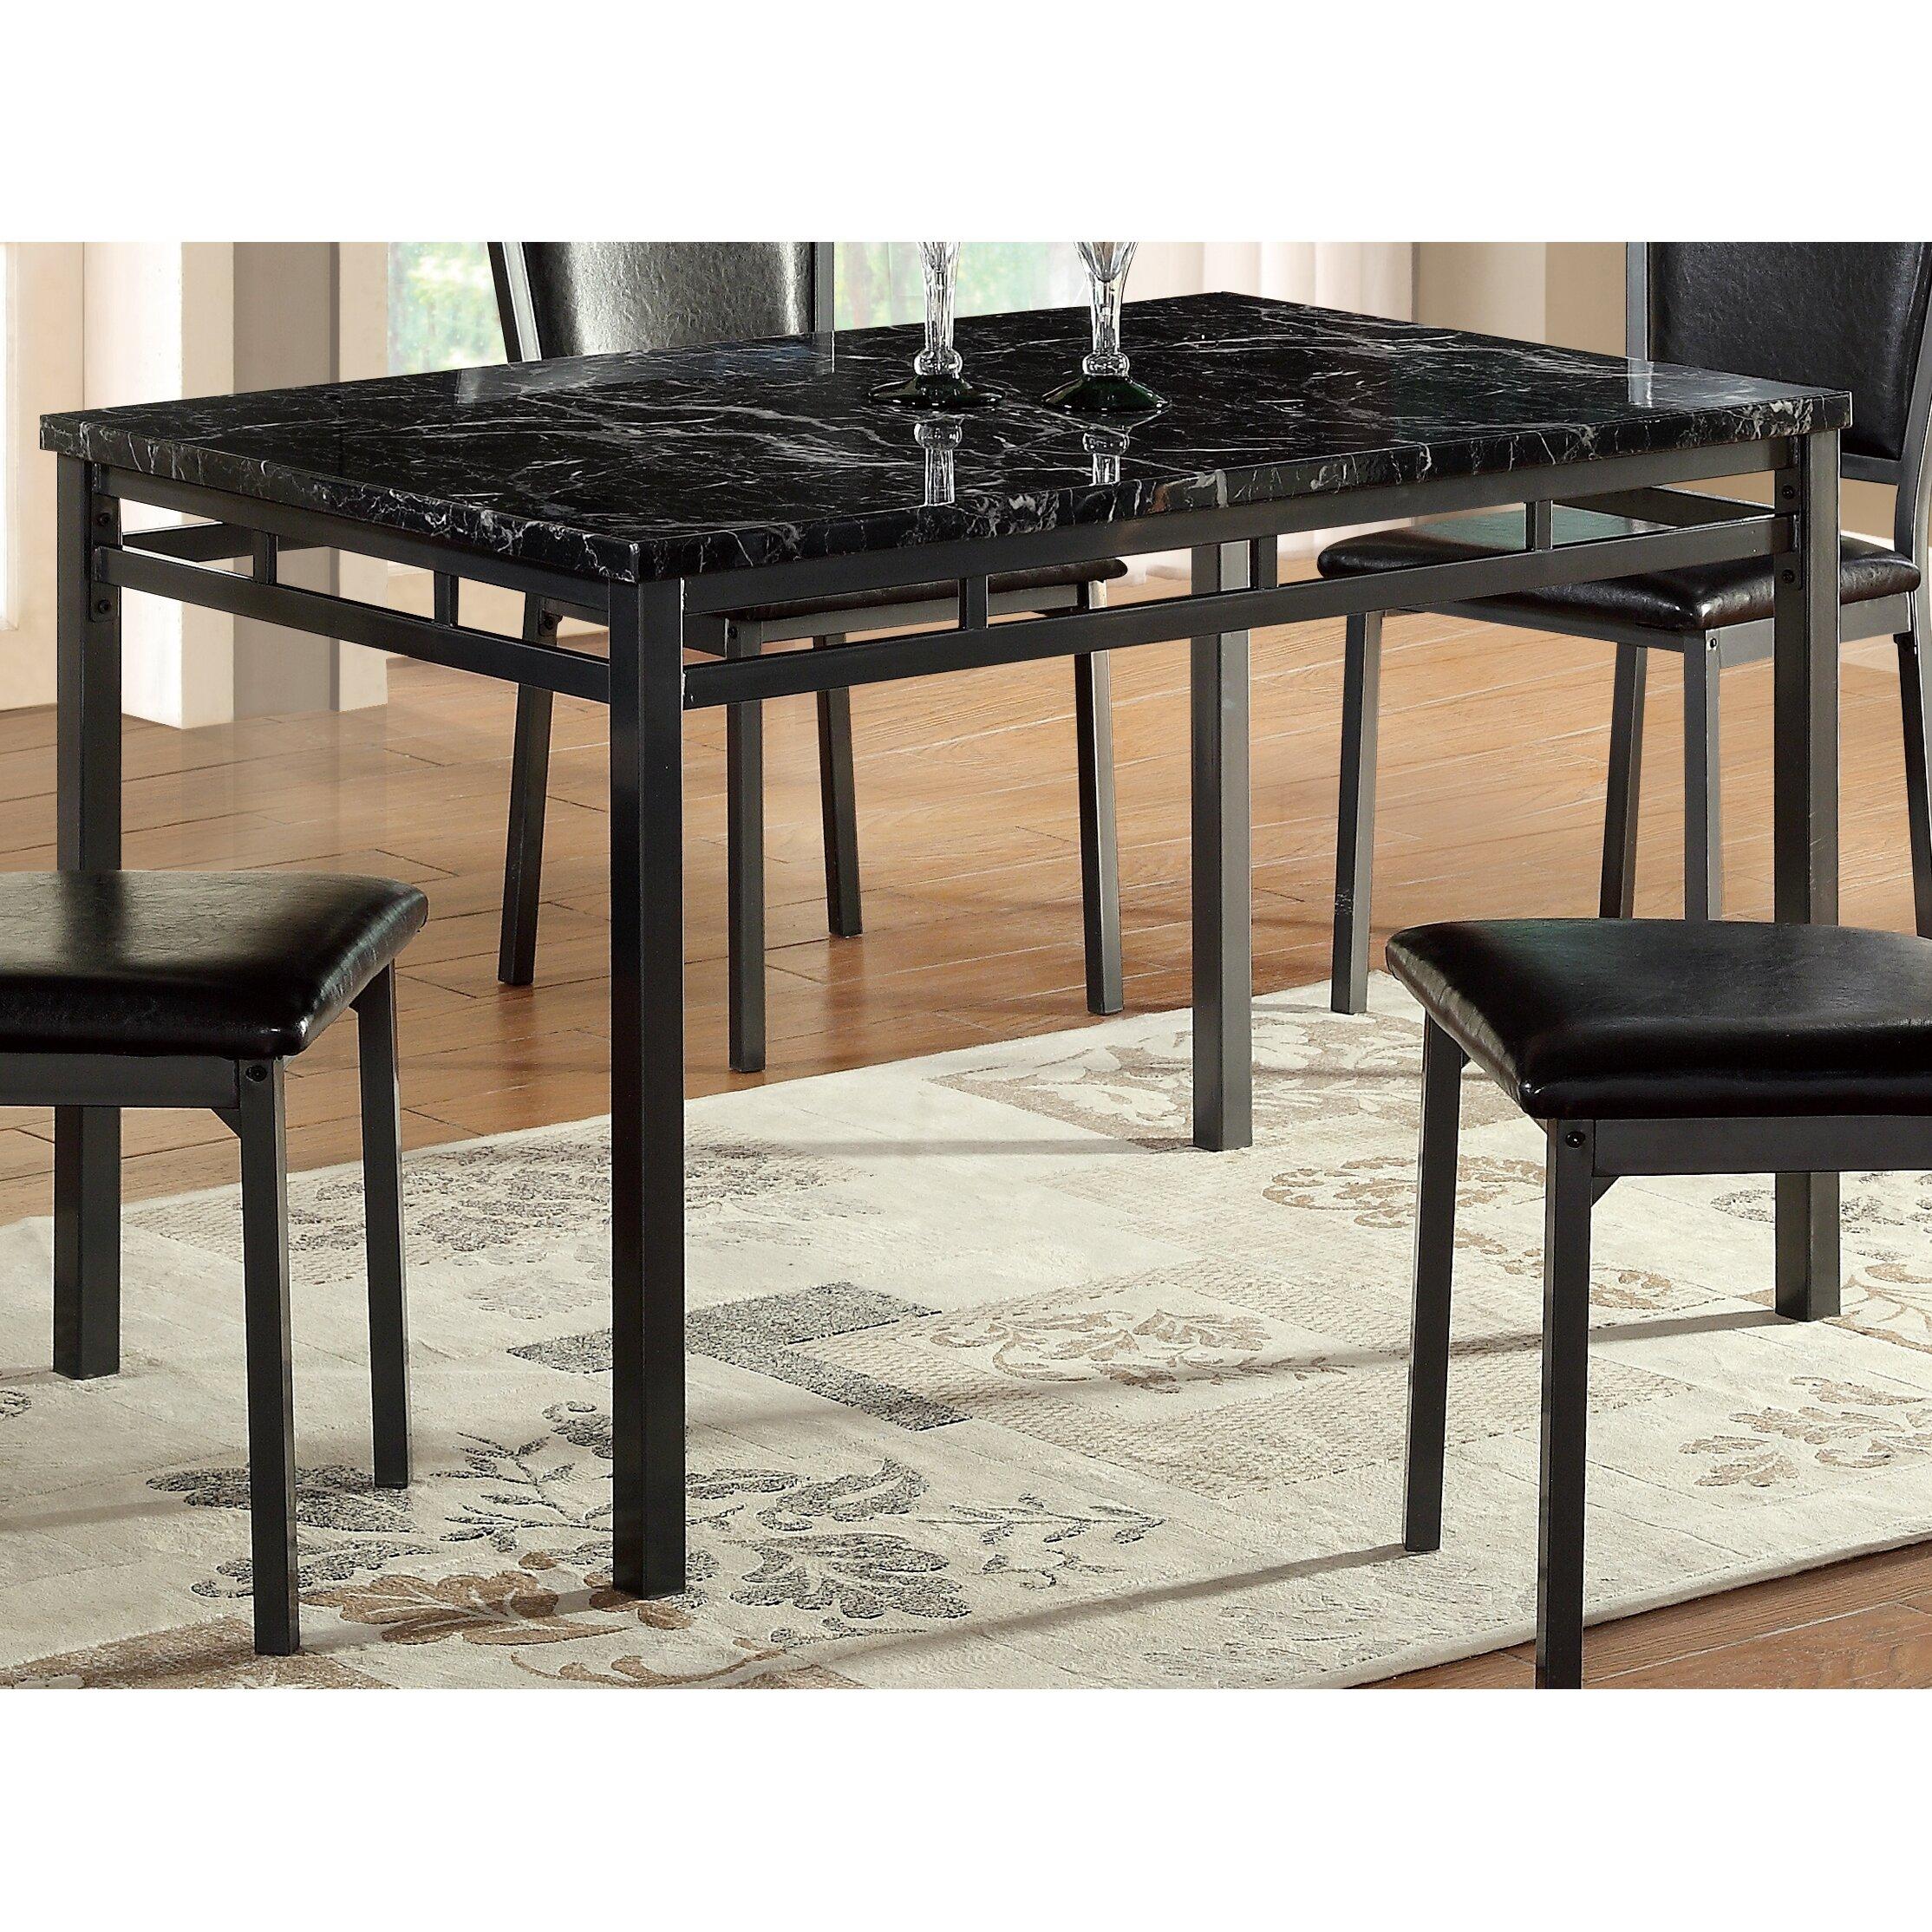 Global Furniture USA Dining Table Wayfair - Dining room furniture usa